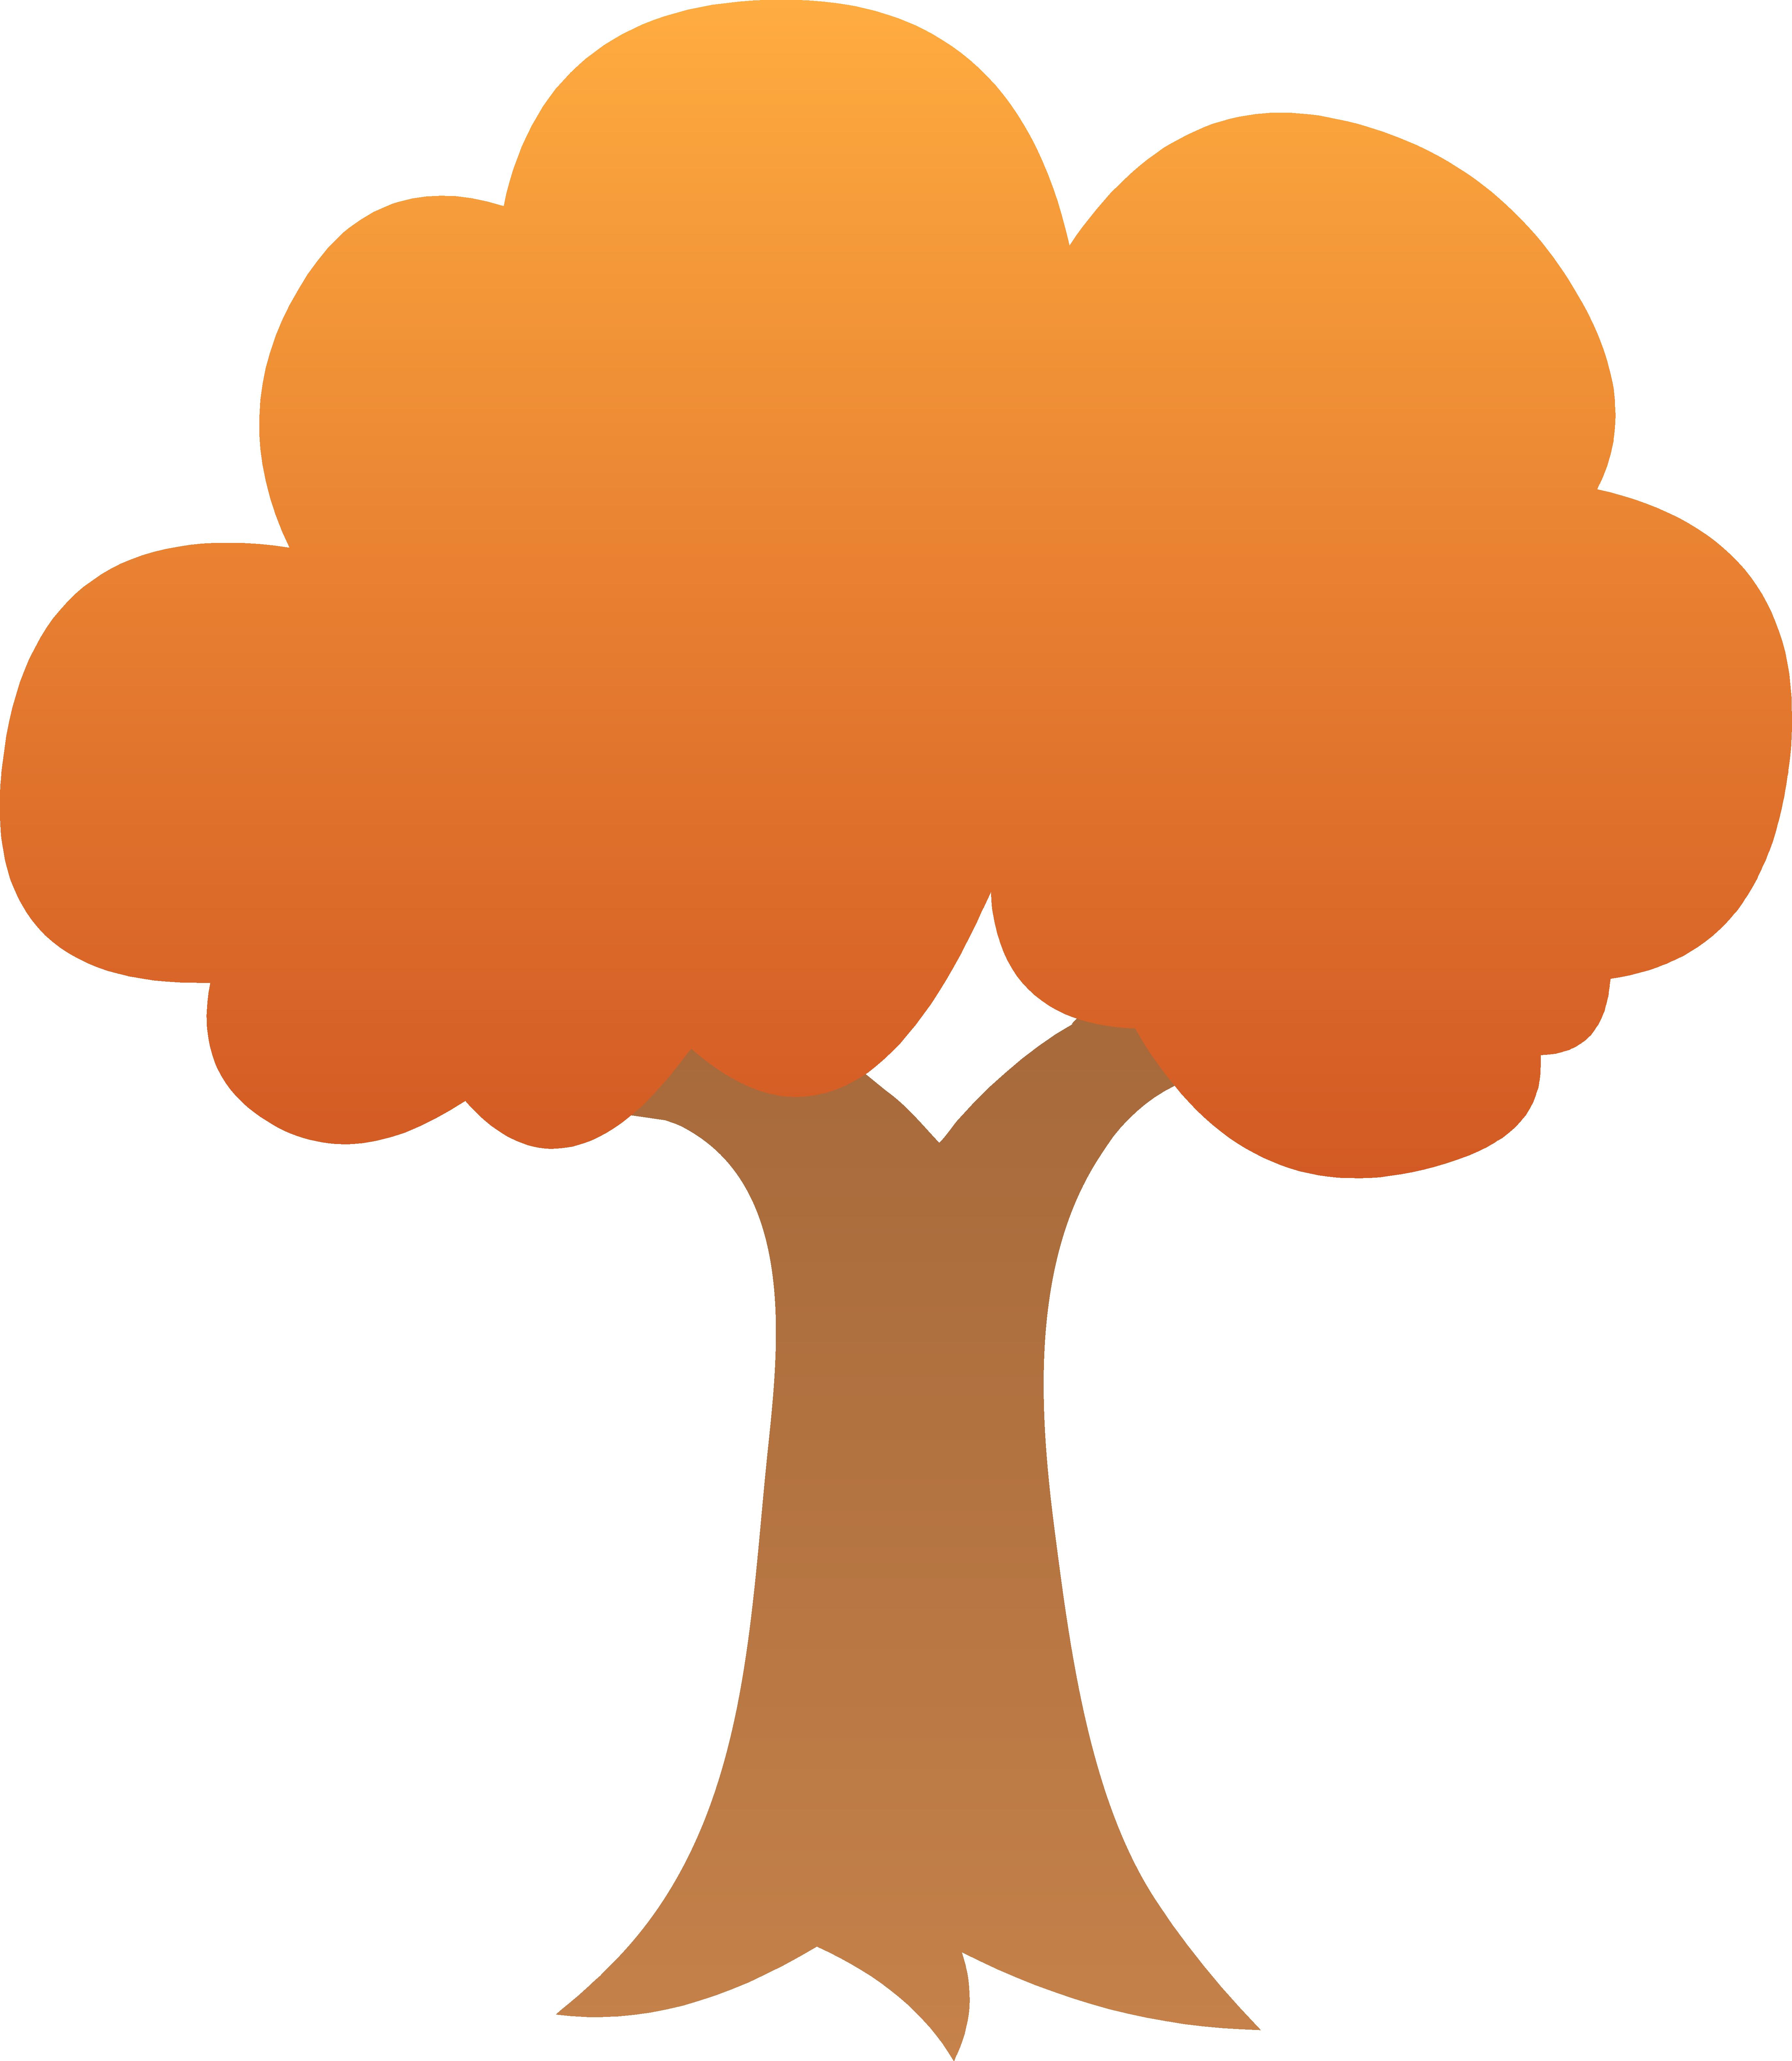 Tree Clip Art | Clipart Panda - Free Clipart Images